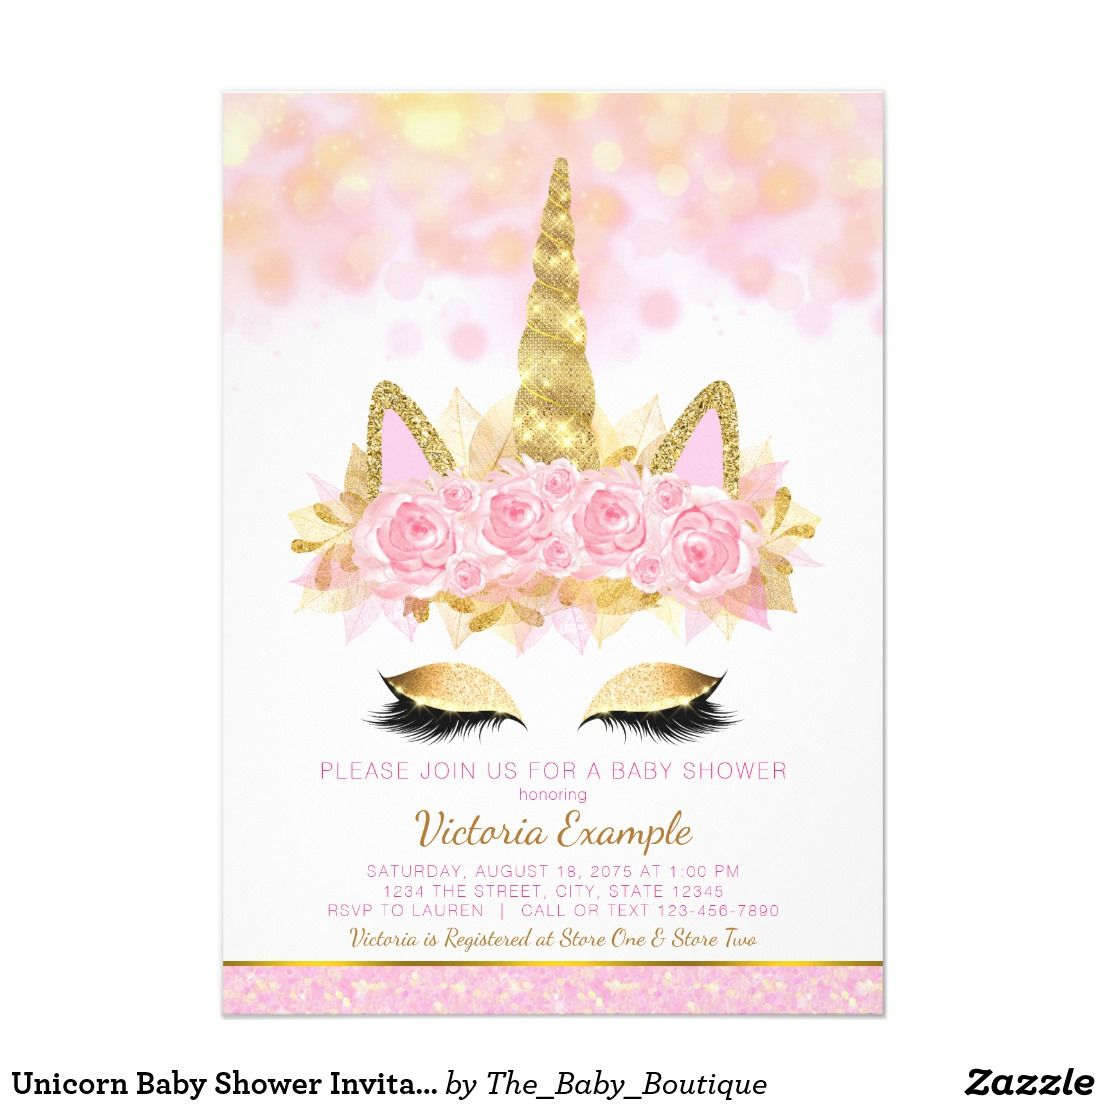 Unicorn Baby Shower Invitations Pink Gold Unicorn Baby Shower